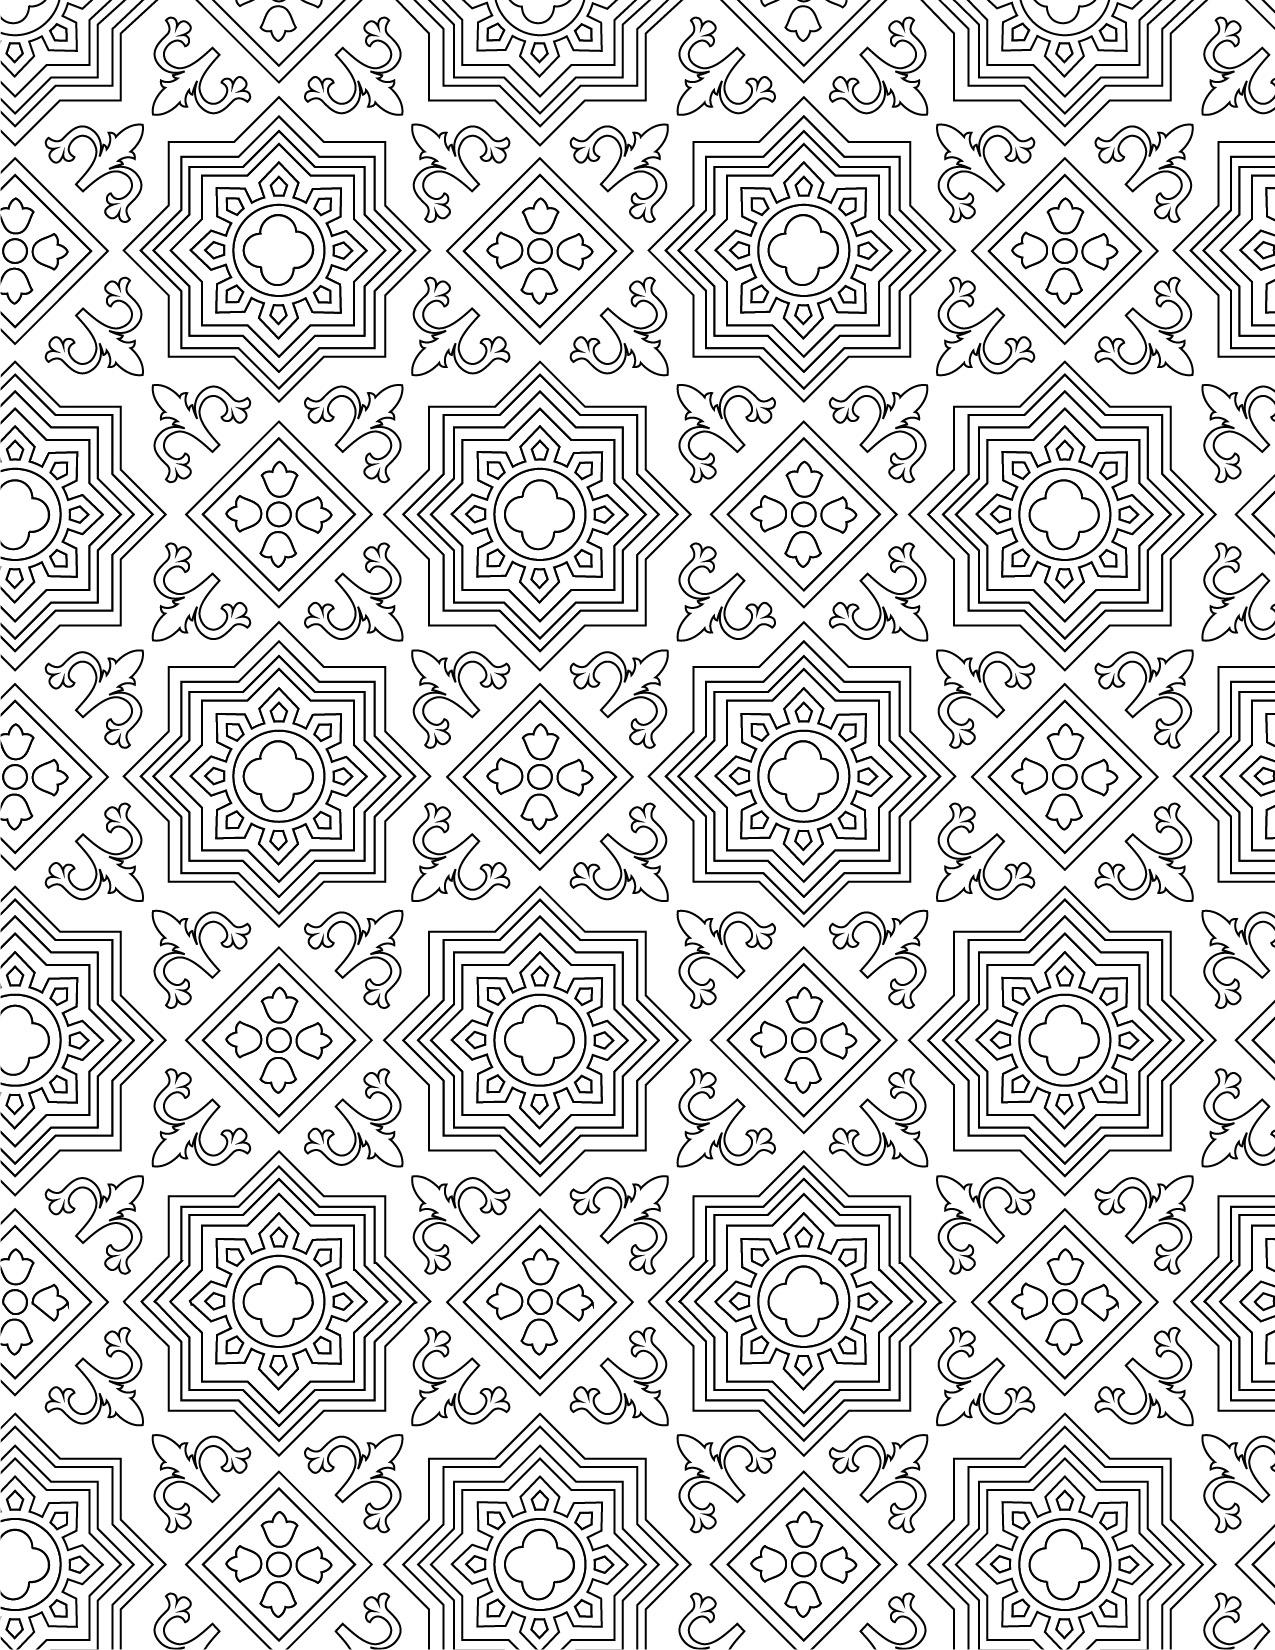 Imprimer coloriage gratuit motif mosaique - Artherapieca